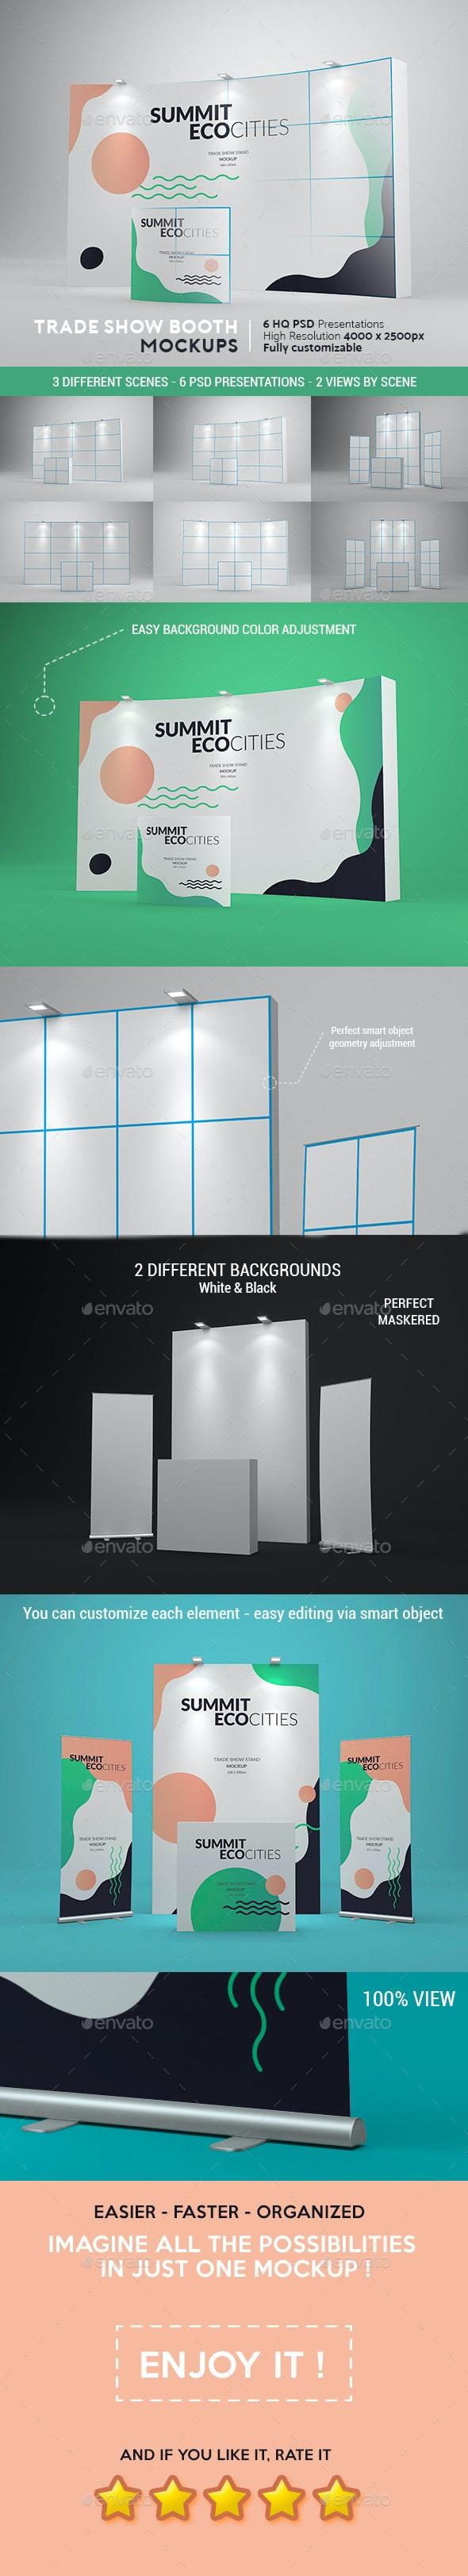 Trade Show Booth Mockups - Product Mock-Ups Graphics